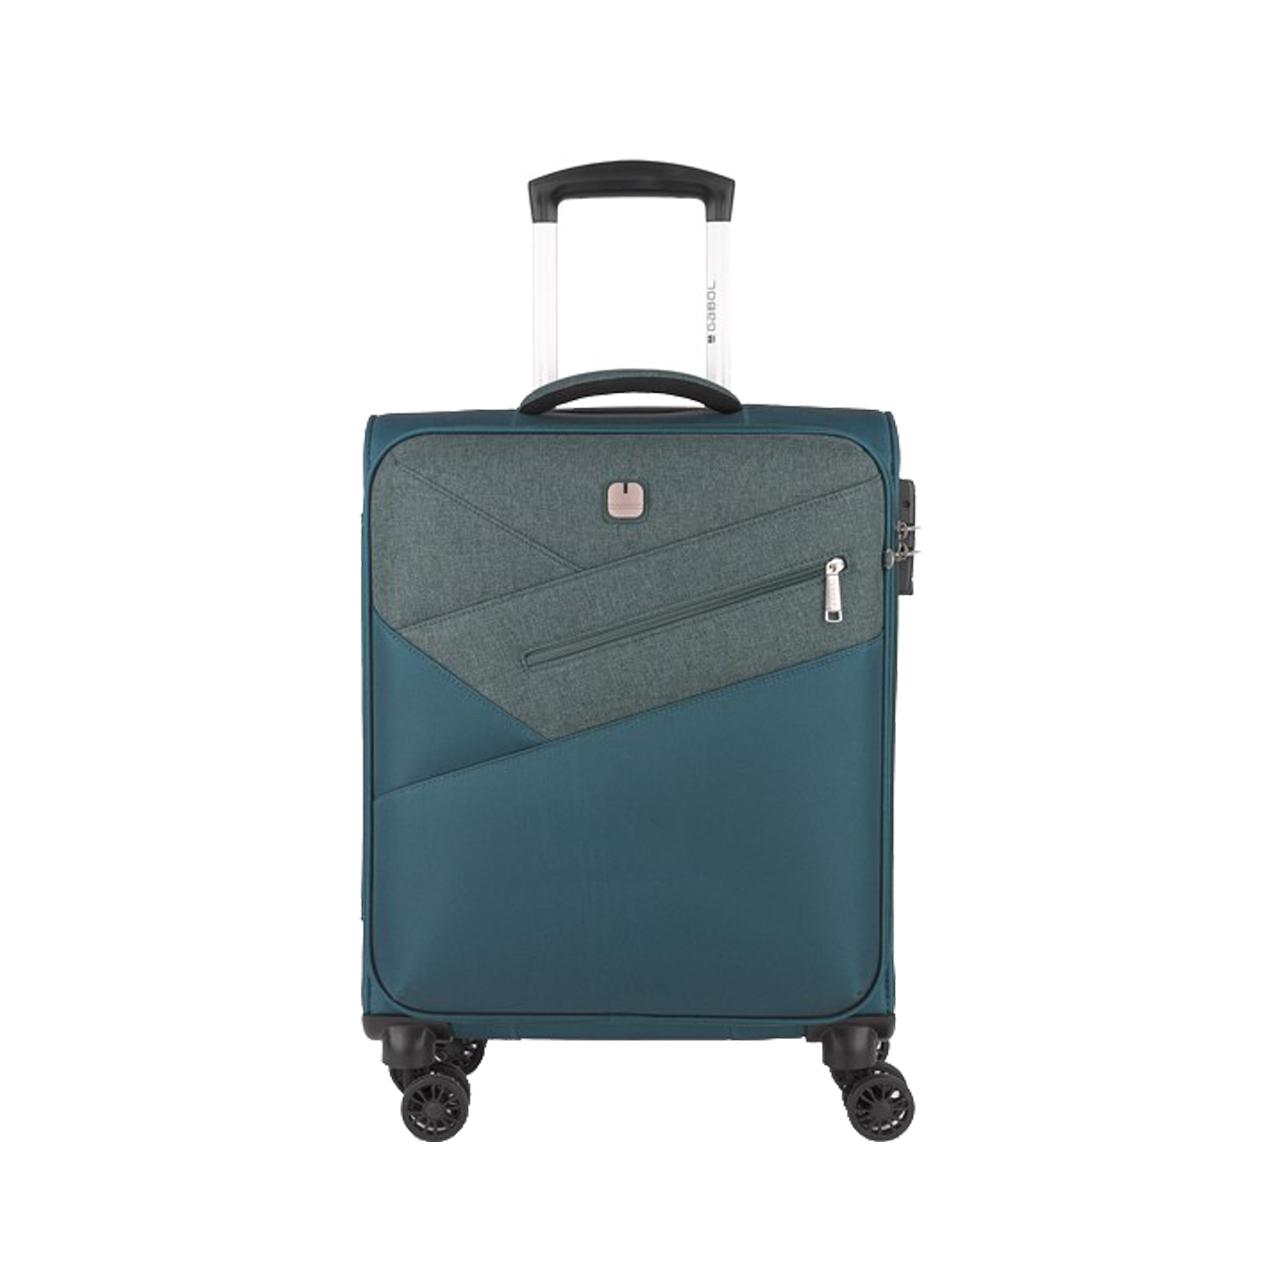 چمدان گابل مدل Mailer 120722 سایز کوچک